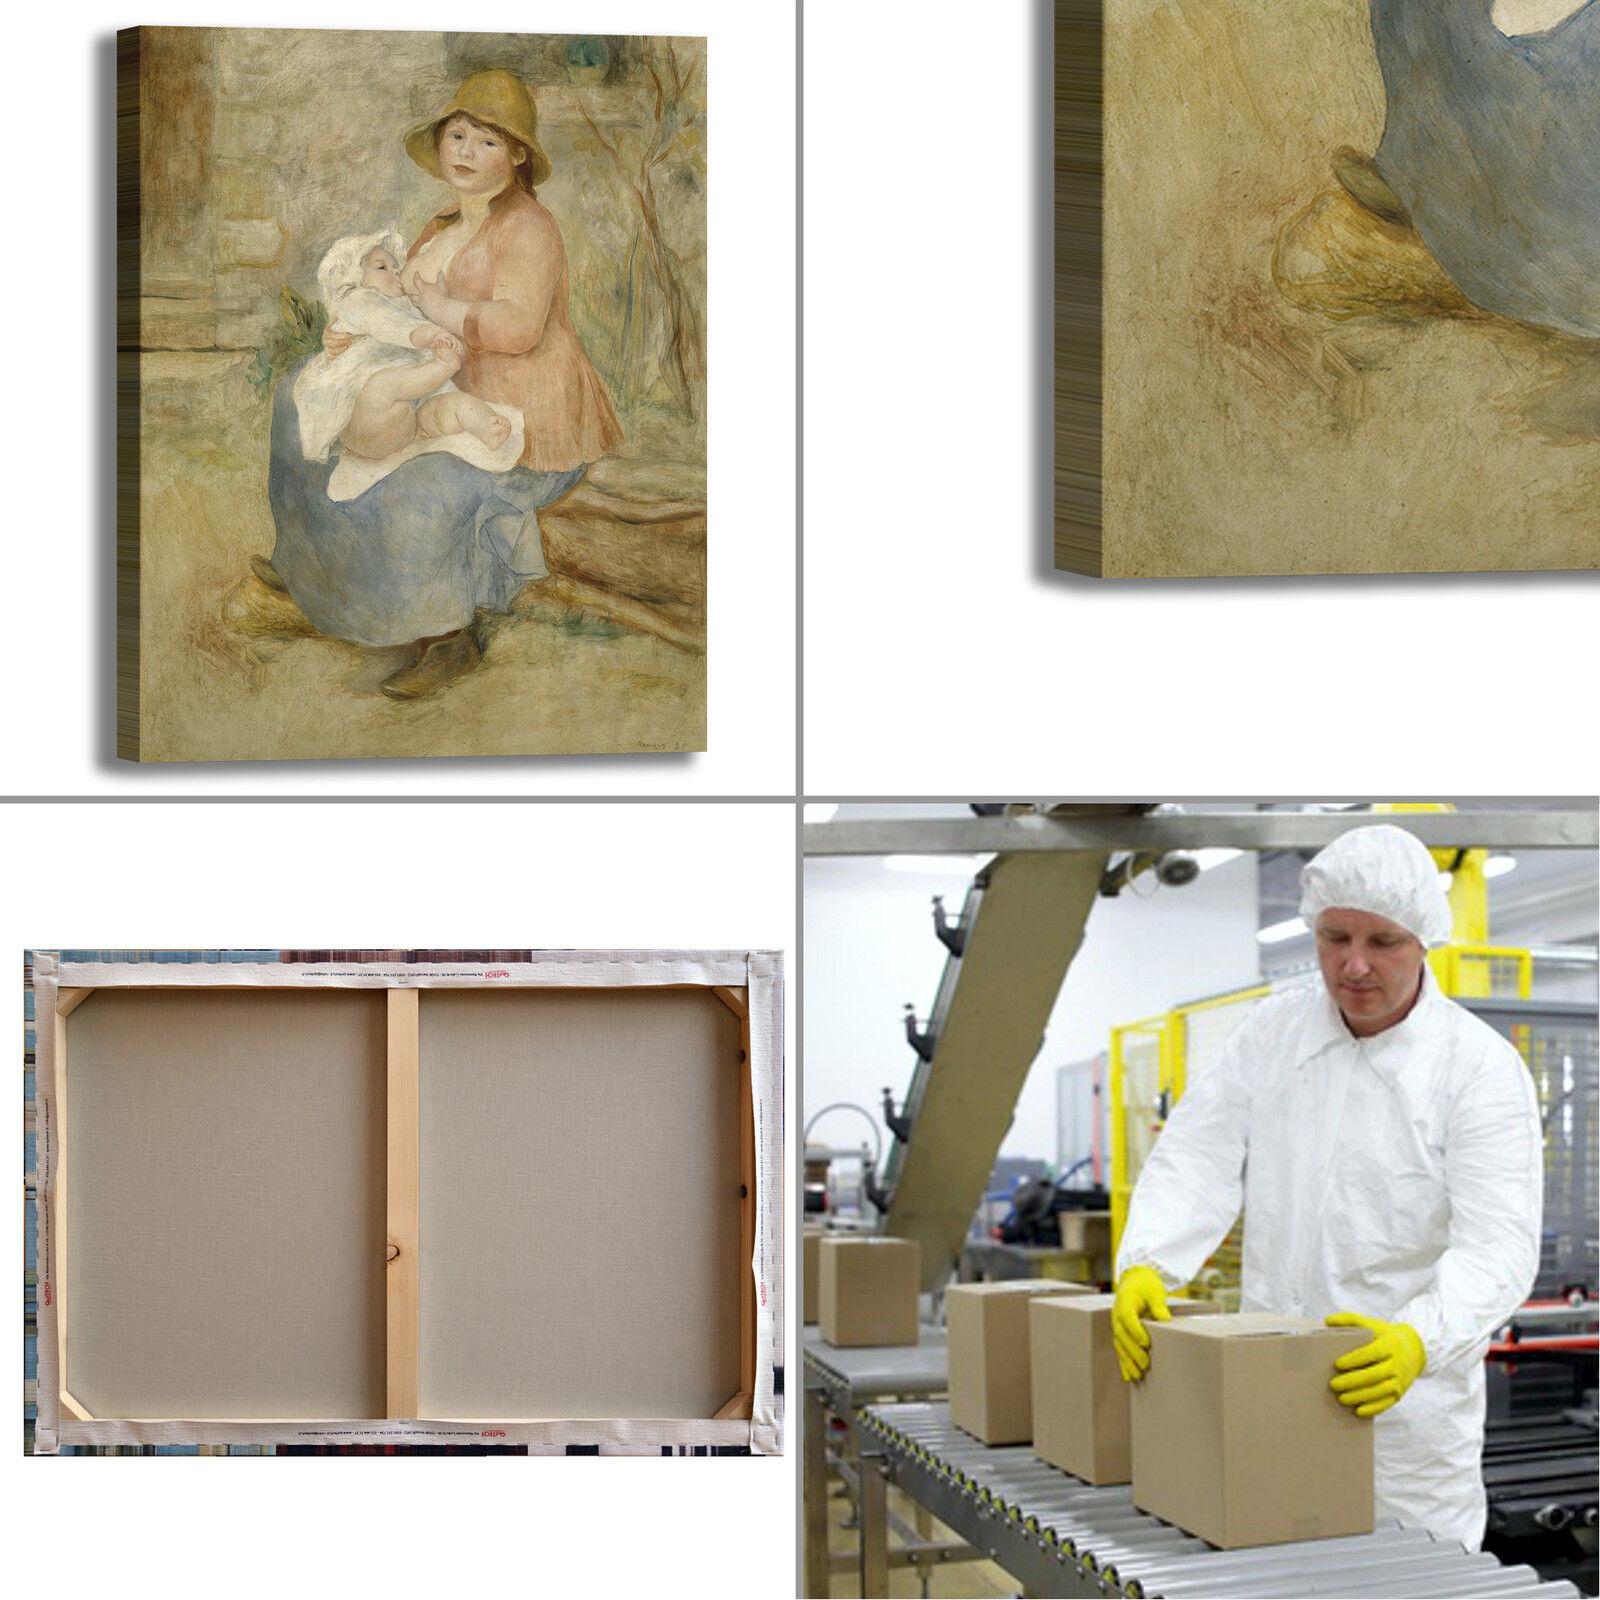 Renoir maternità design quadro stampa telaio tela dipinto telaio stampa arRouge o casa 2a641f